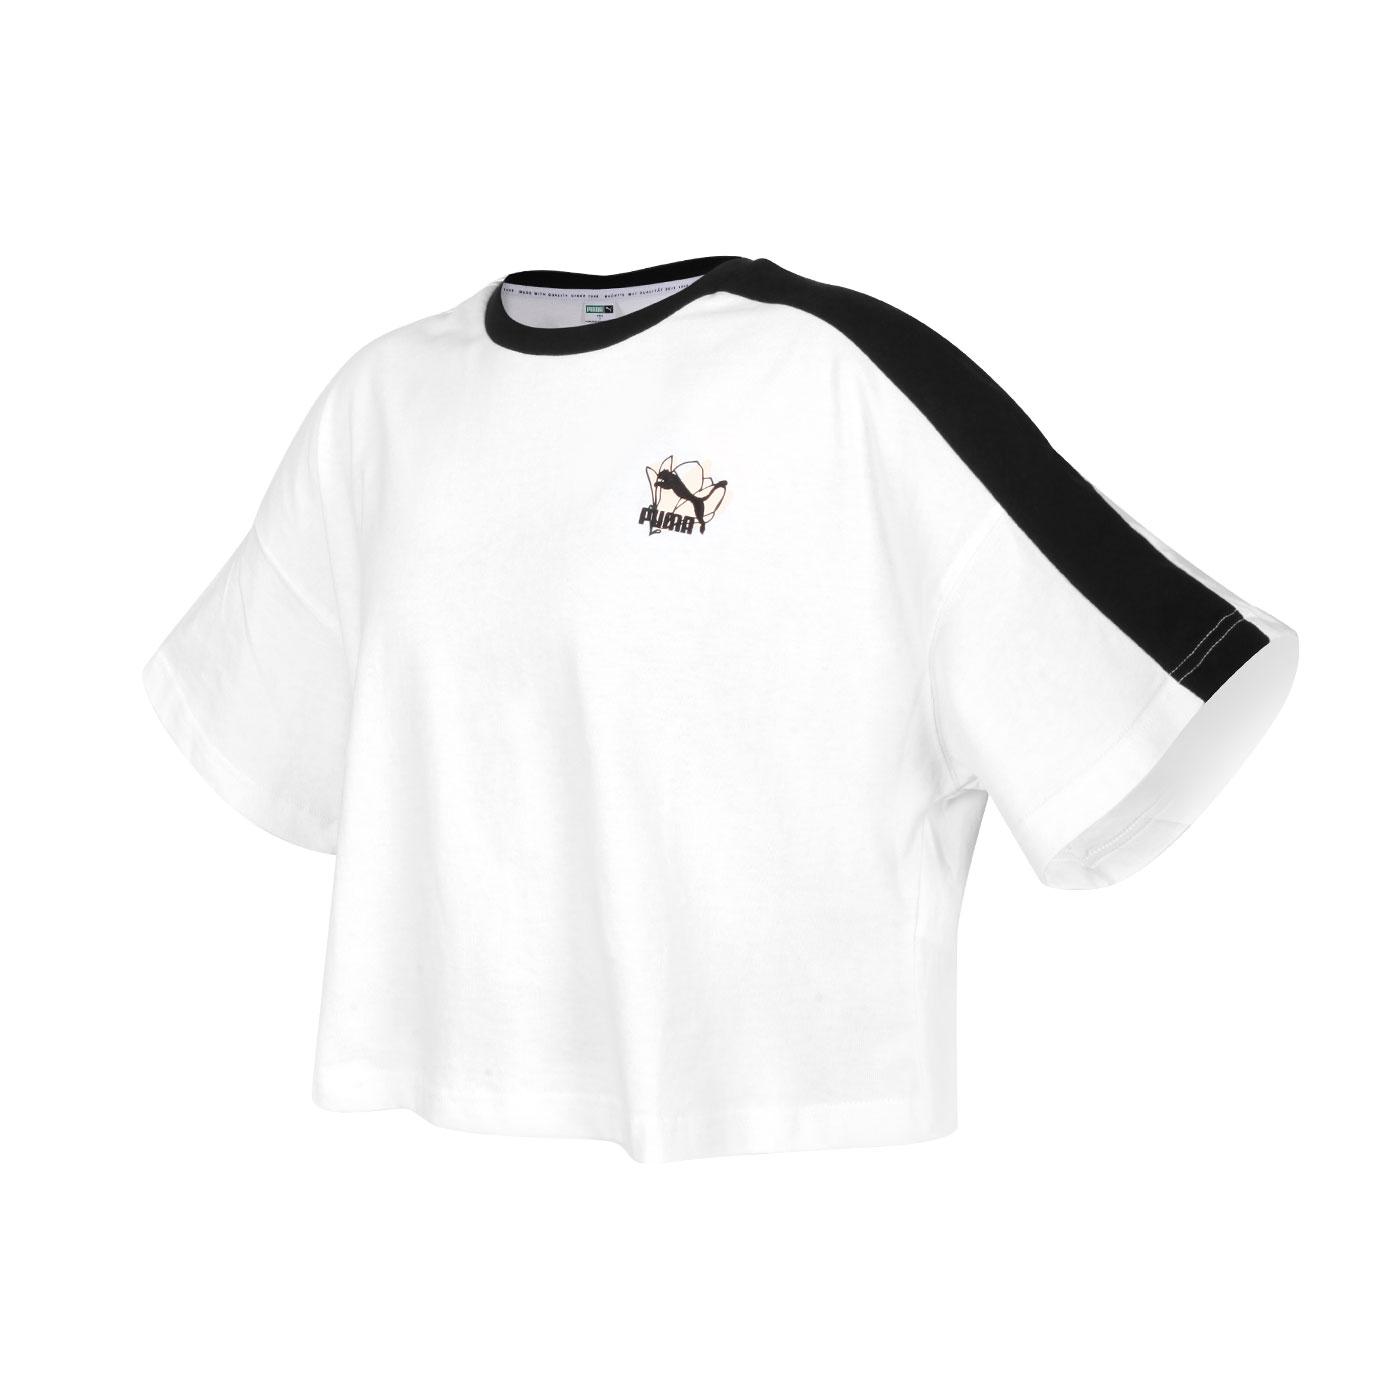 PUMA 女款Floral短袖T恤 53225802